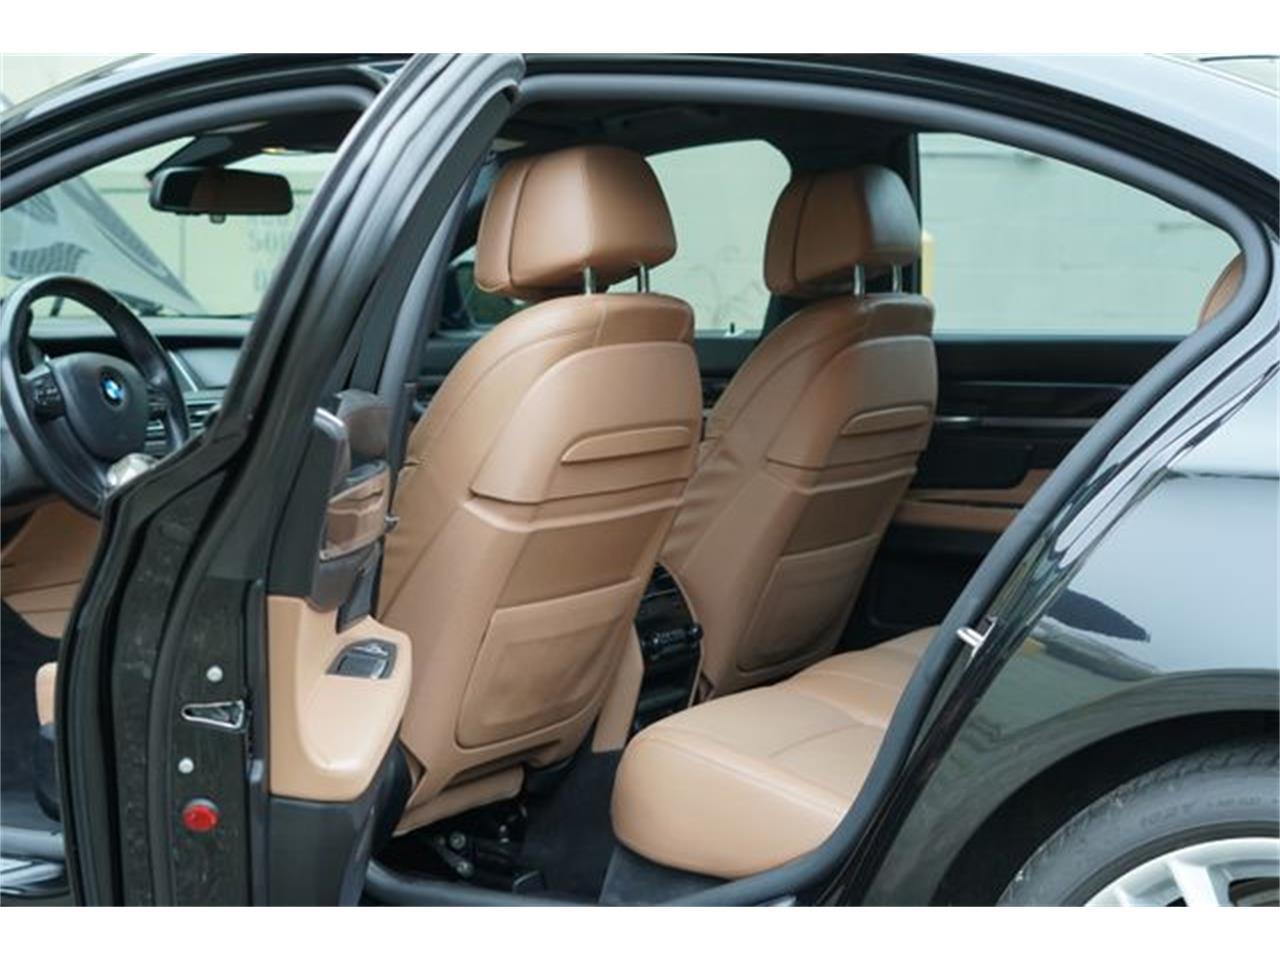 2014 BMW 7 Series (CC-1335322) for sale in Aiken, South Carolina